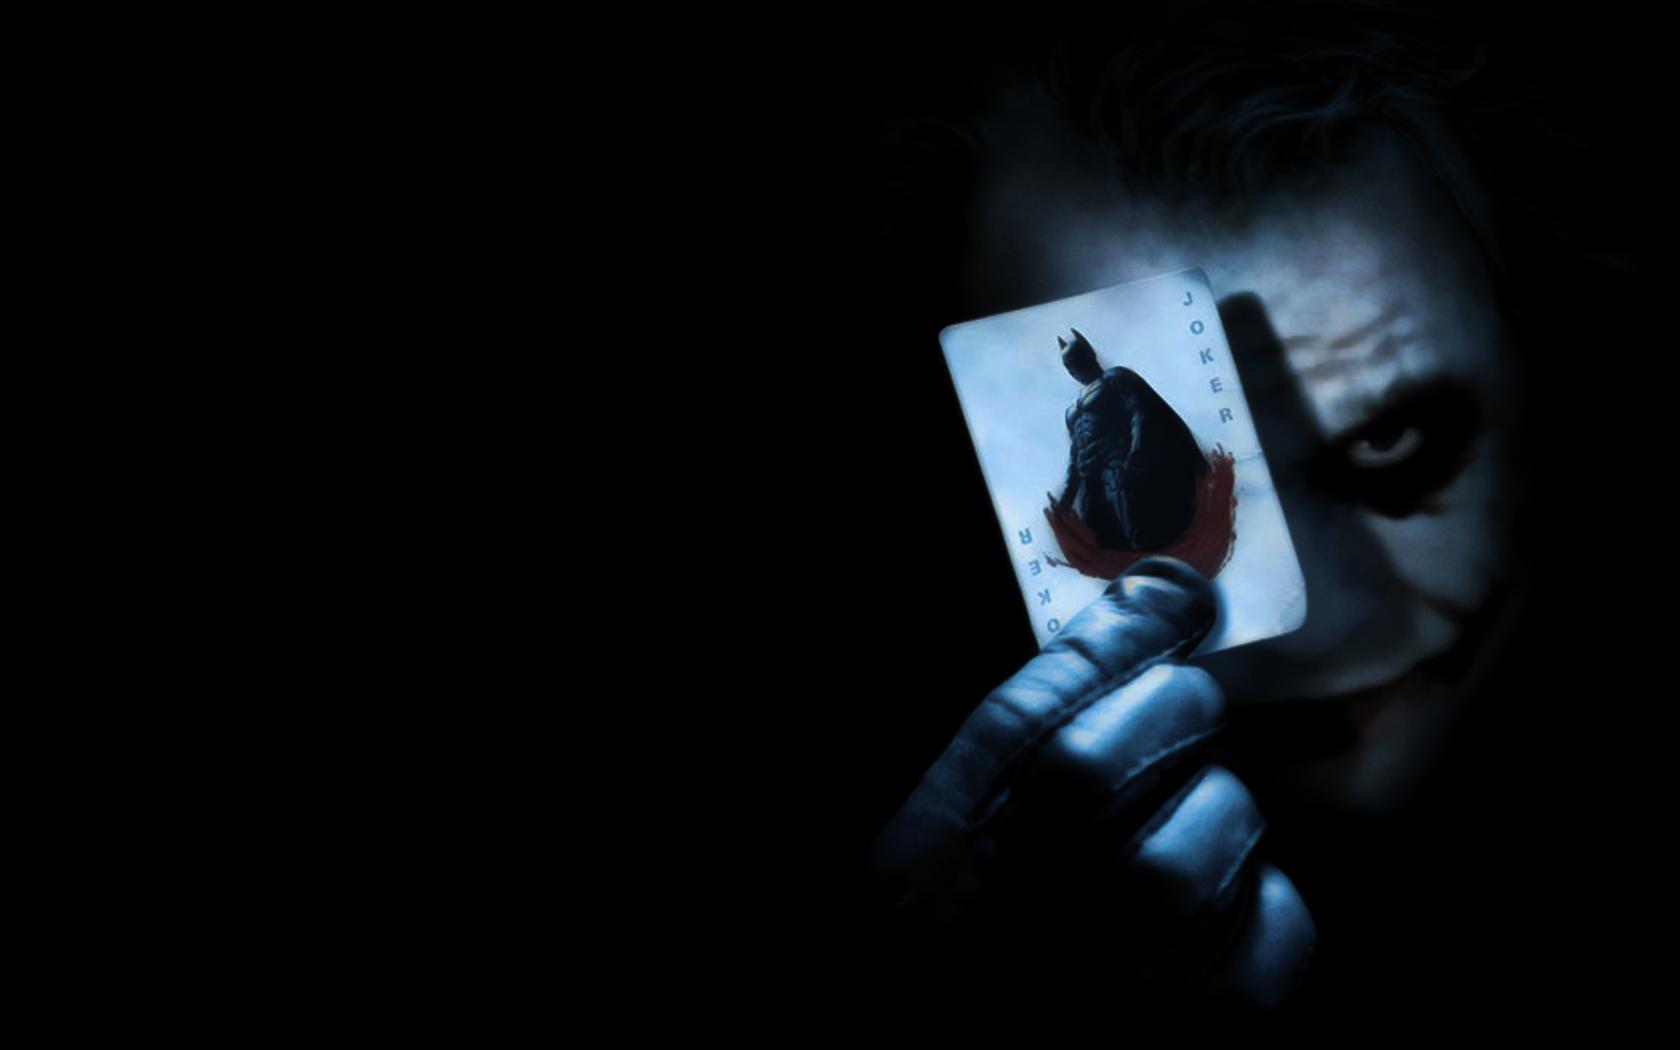 Batman desktop image Batman wallpapers 1680x1050